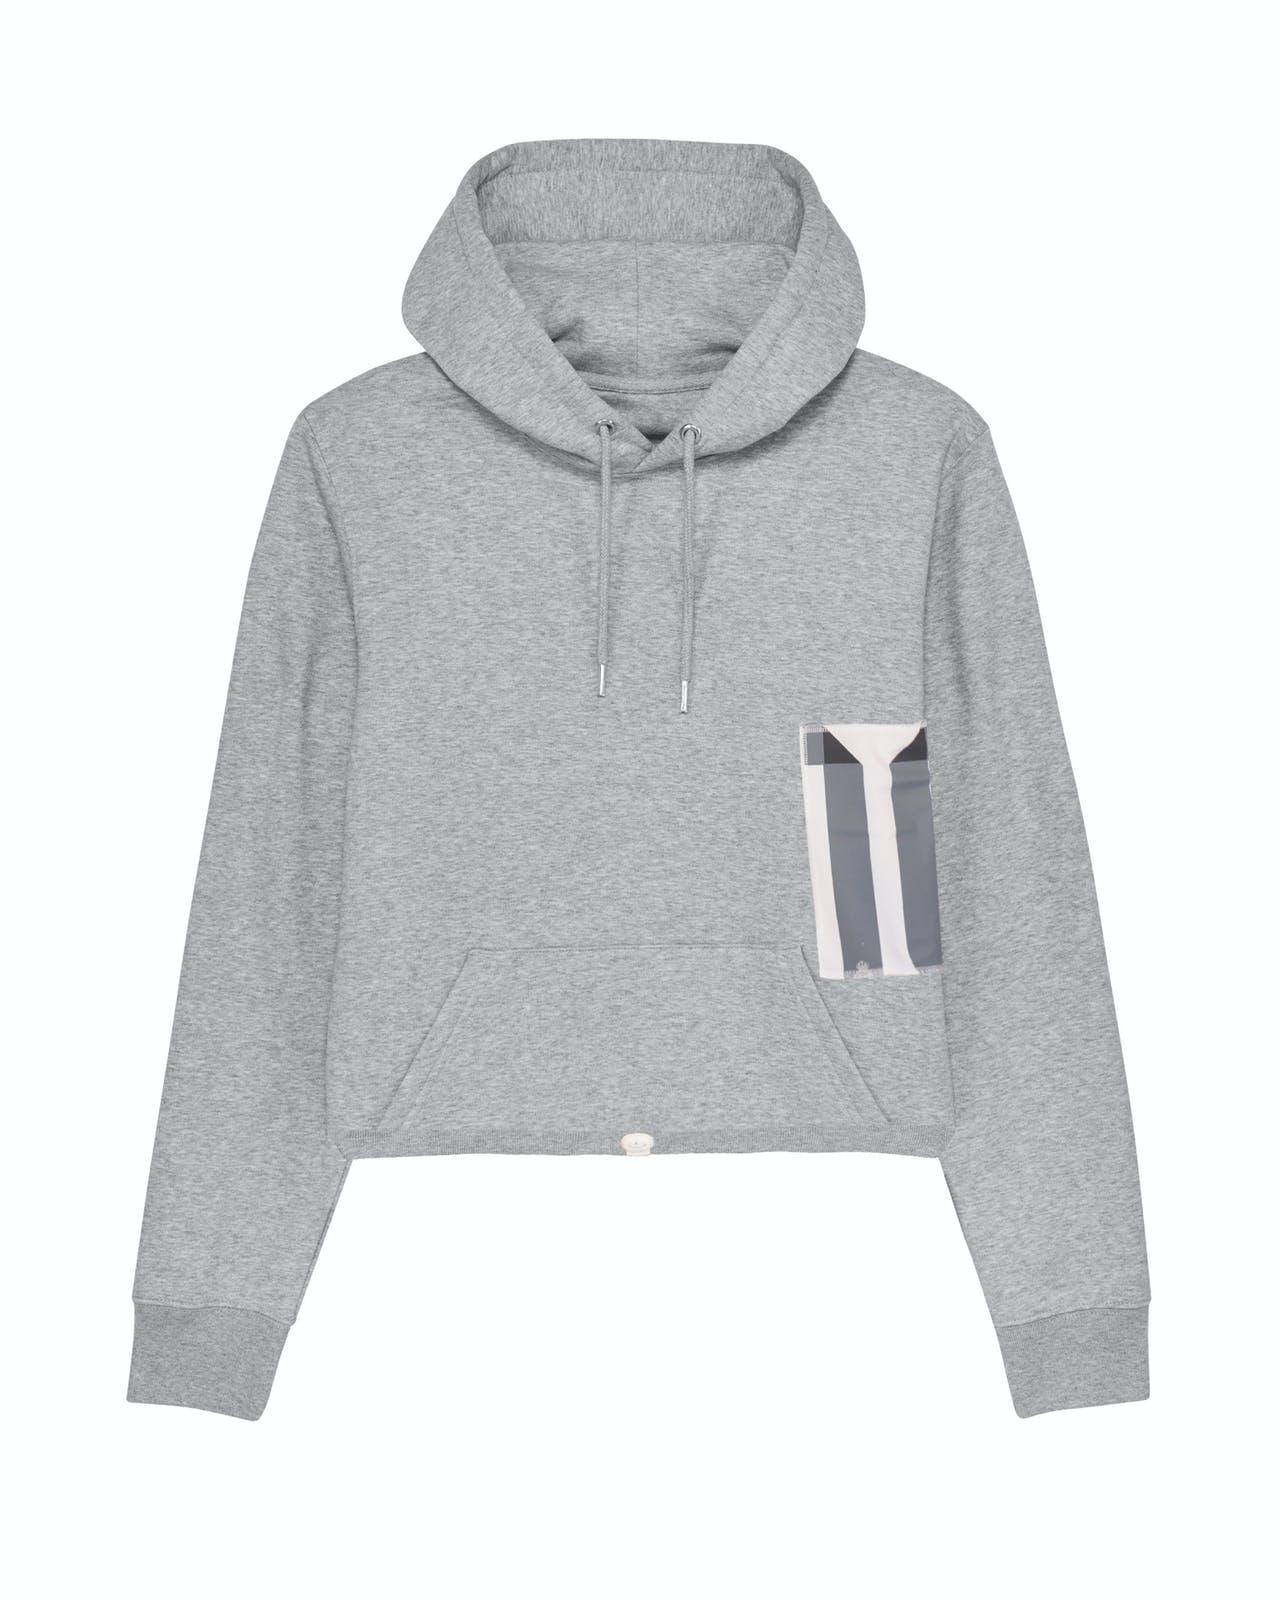 Remix hoodie grey